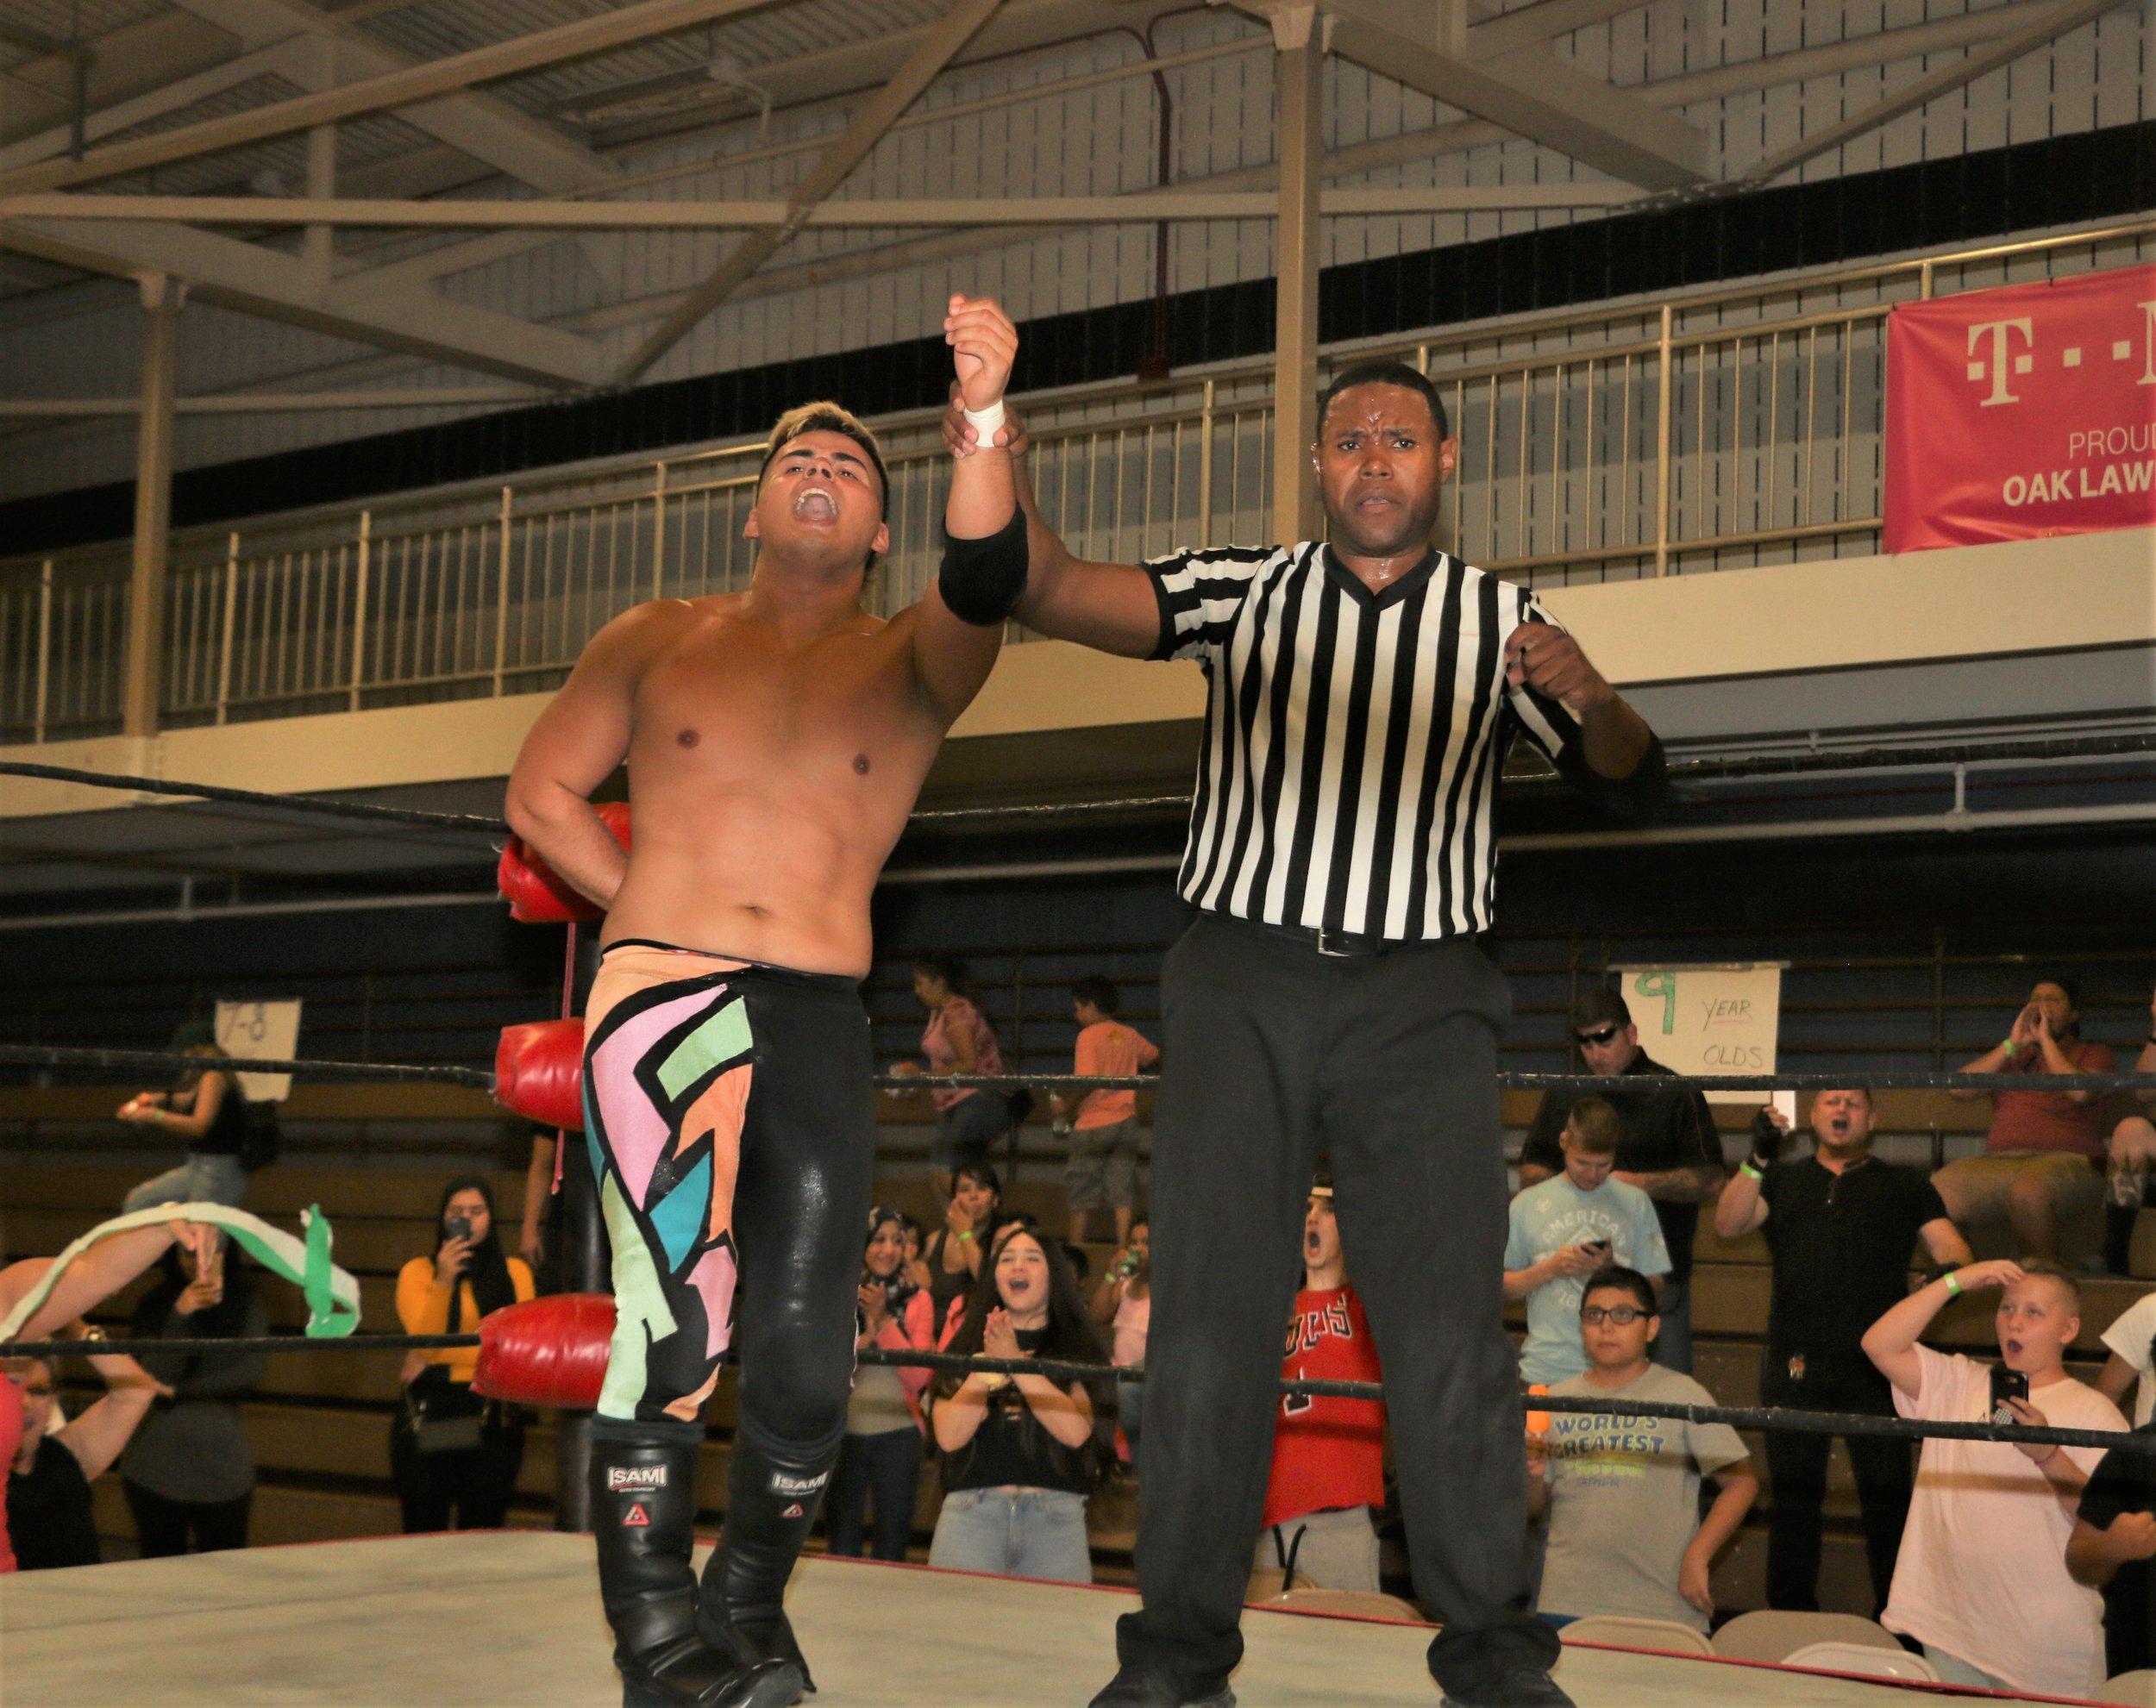 Referee Jessie Bush raises the hand of Joe Alonzo.